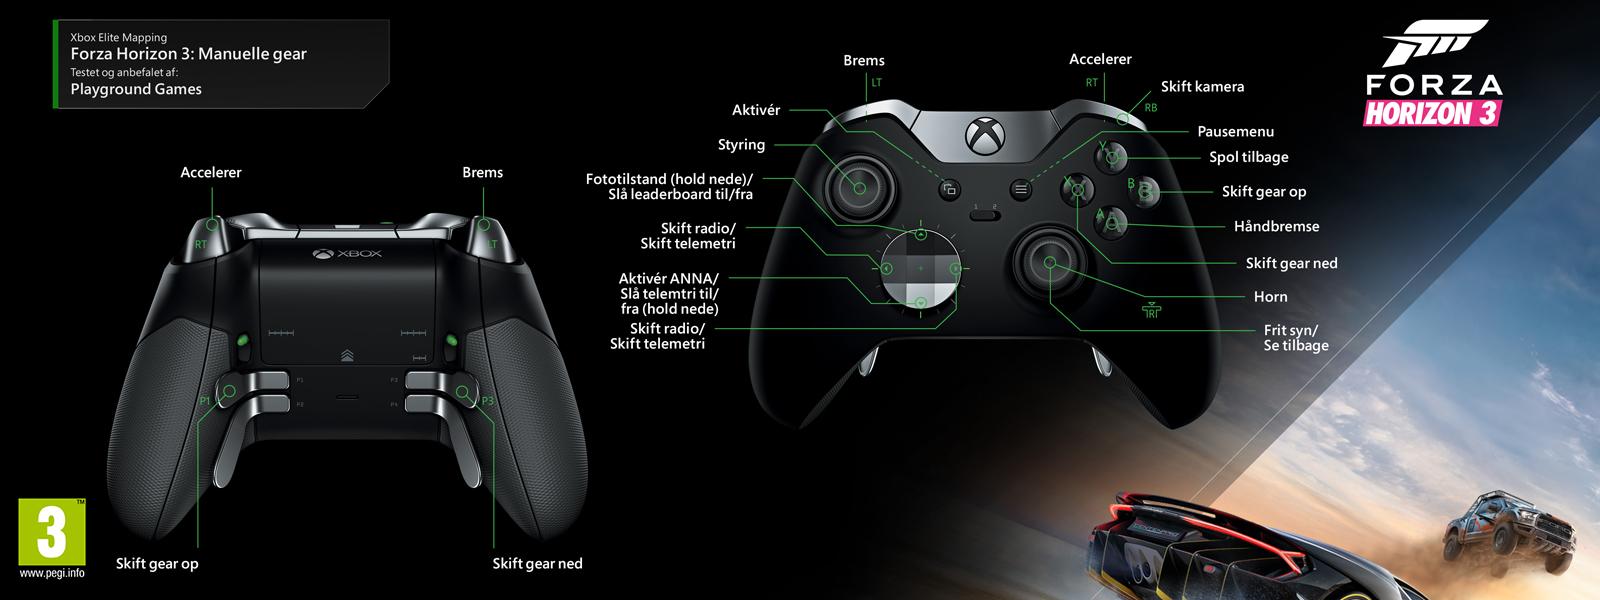 Forza Horizon 3 – Elite-konfiguration til manuelt gear